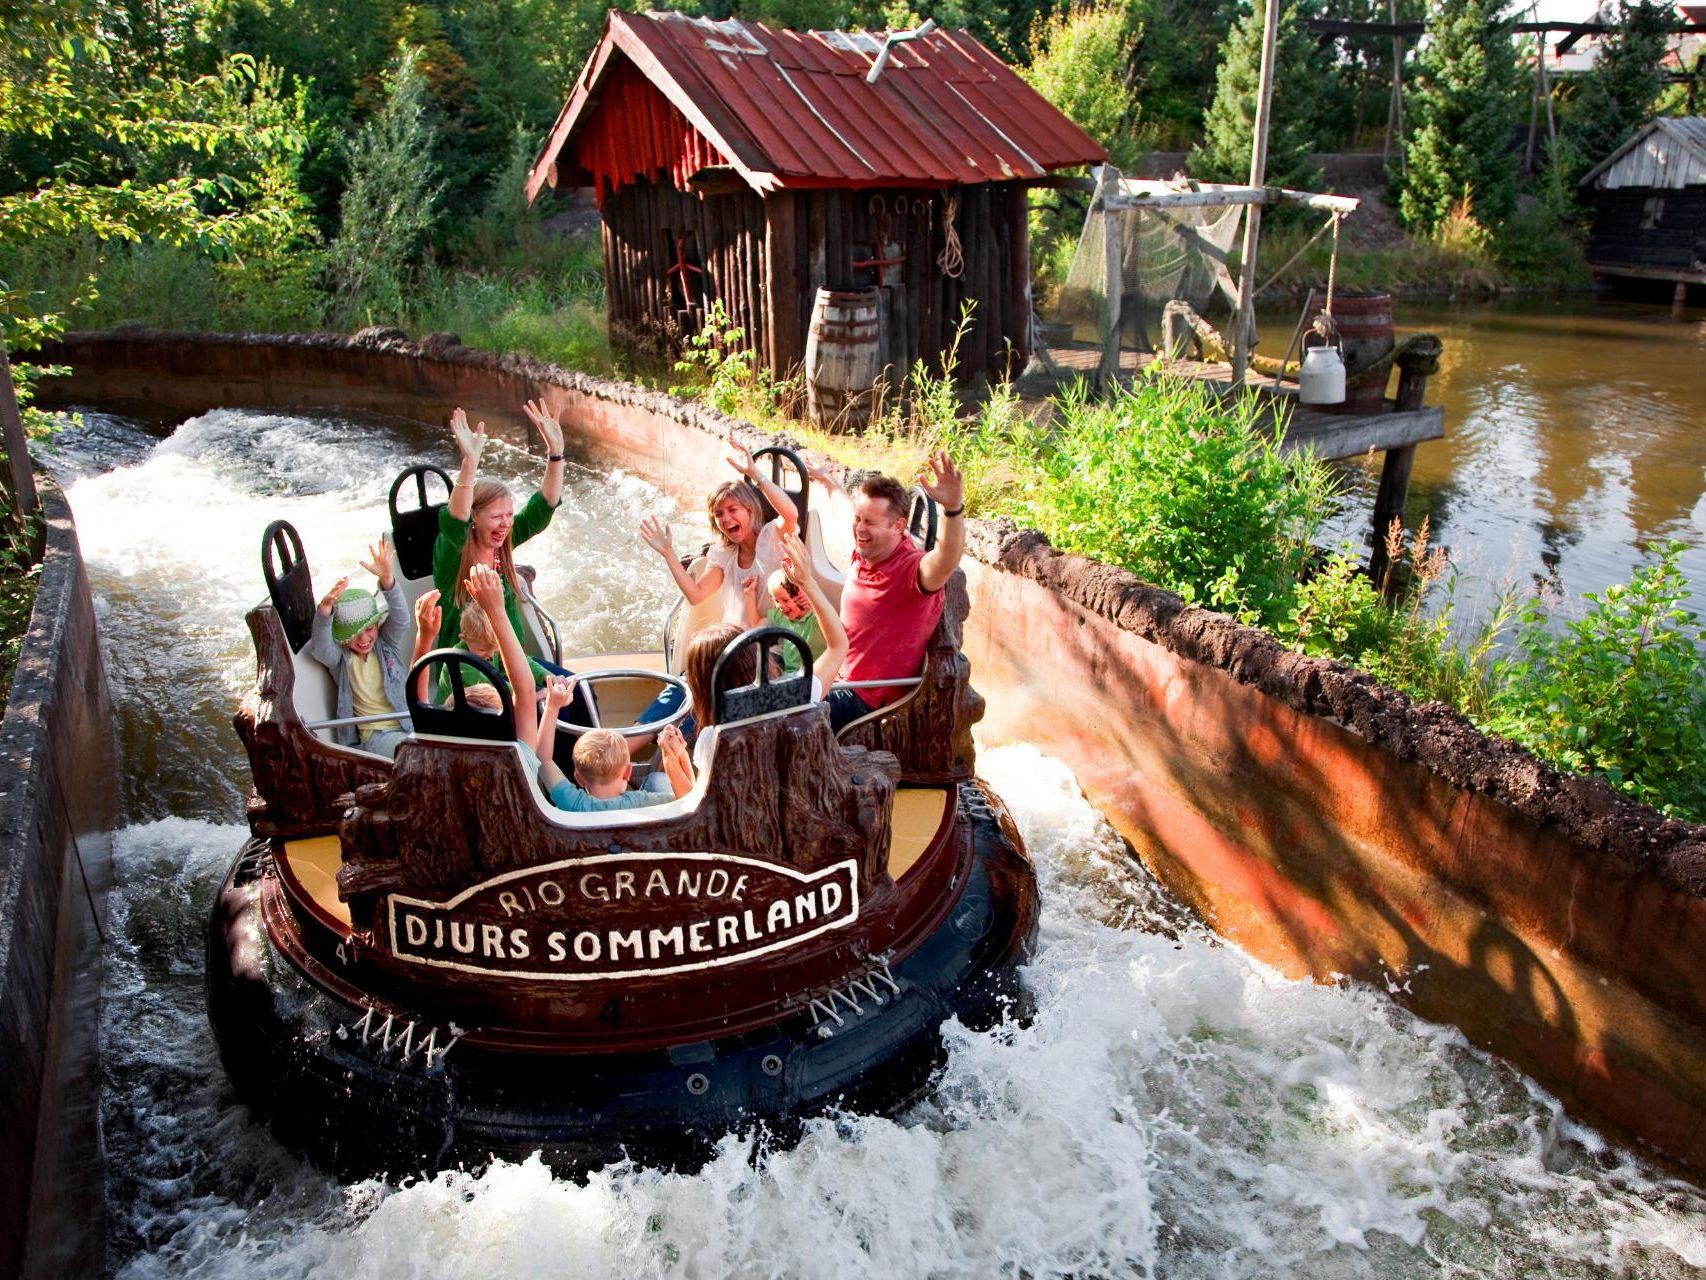 interlink rapid river water ride denmark